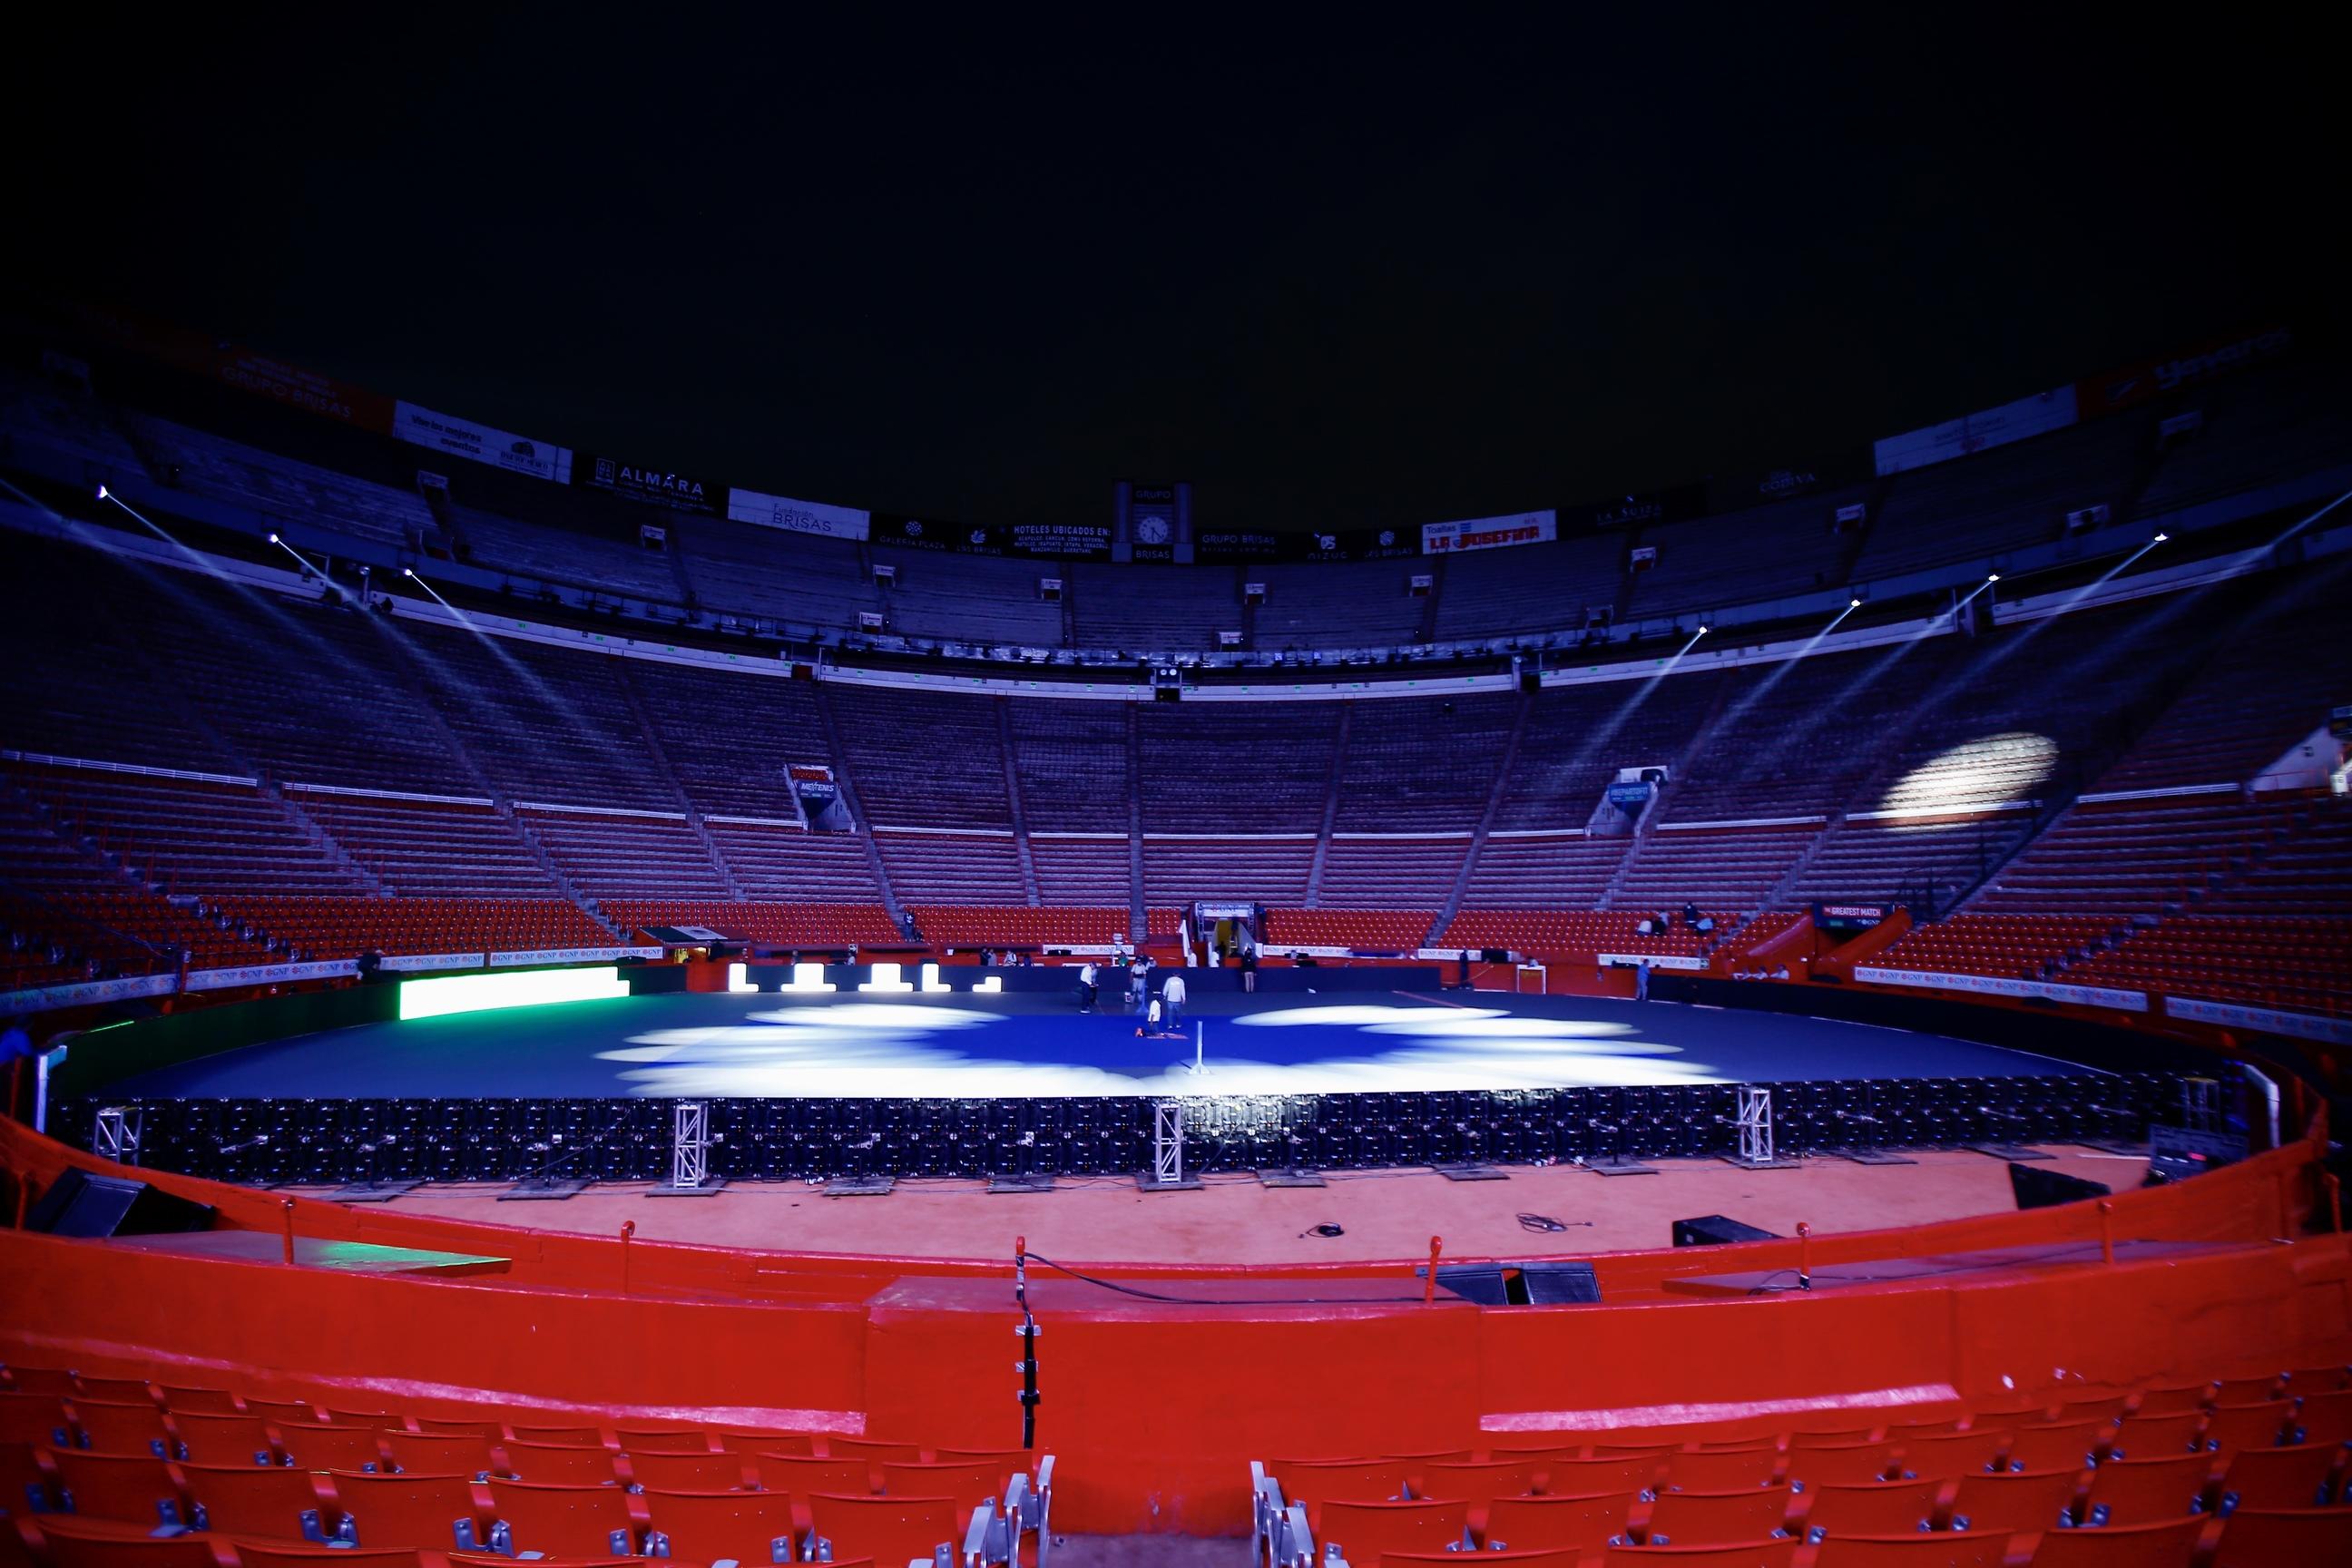 Numeralia de la Plaza México y The Greatest Match